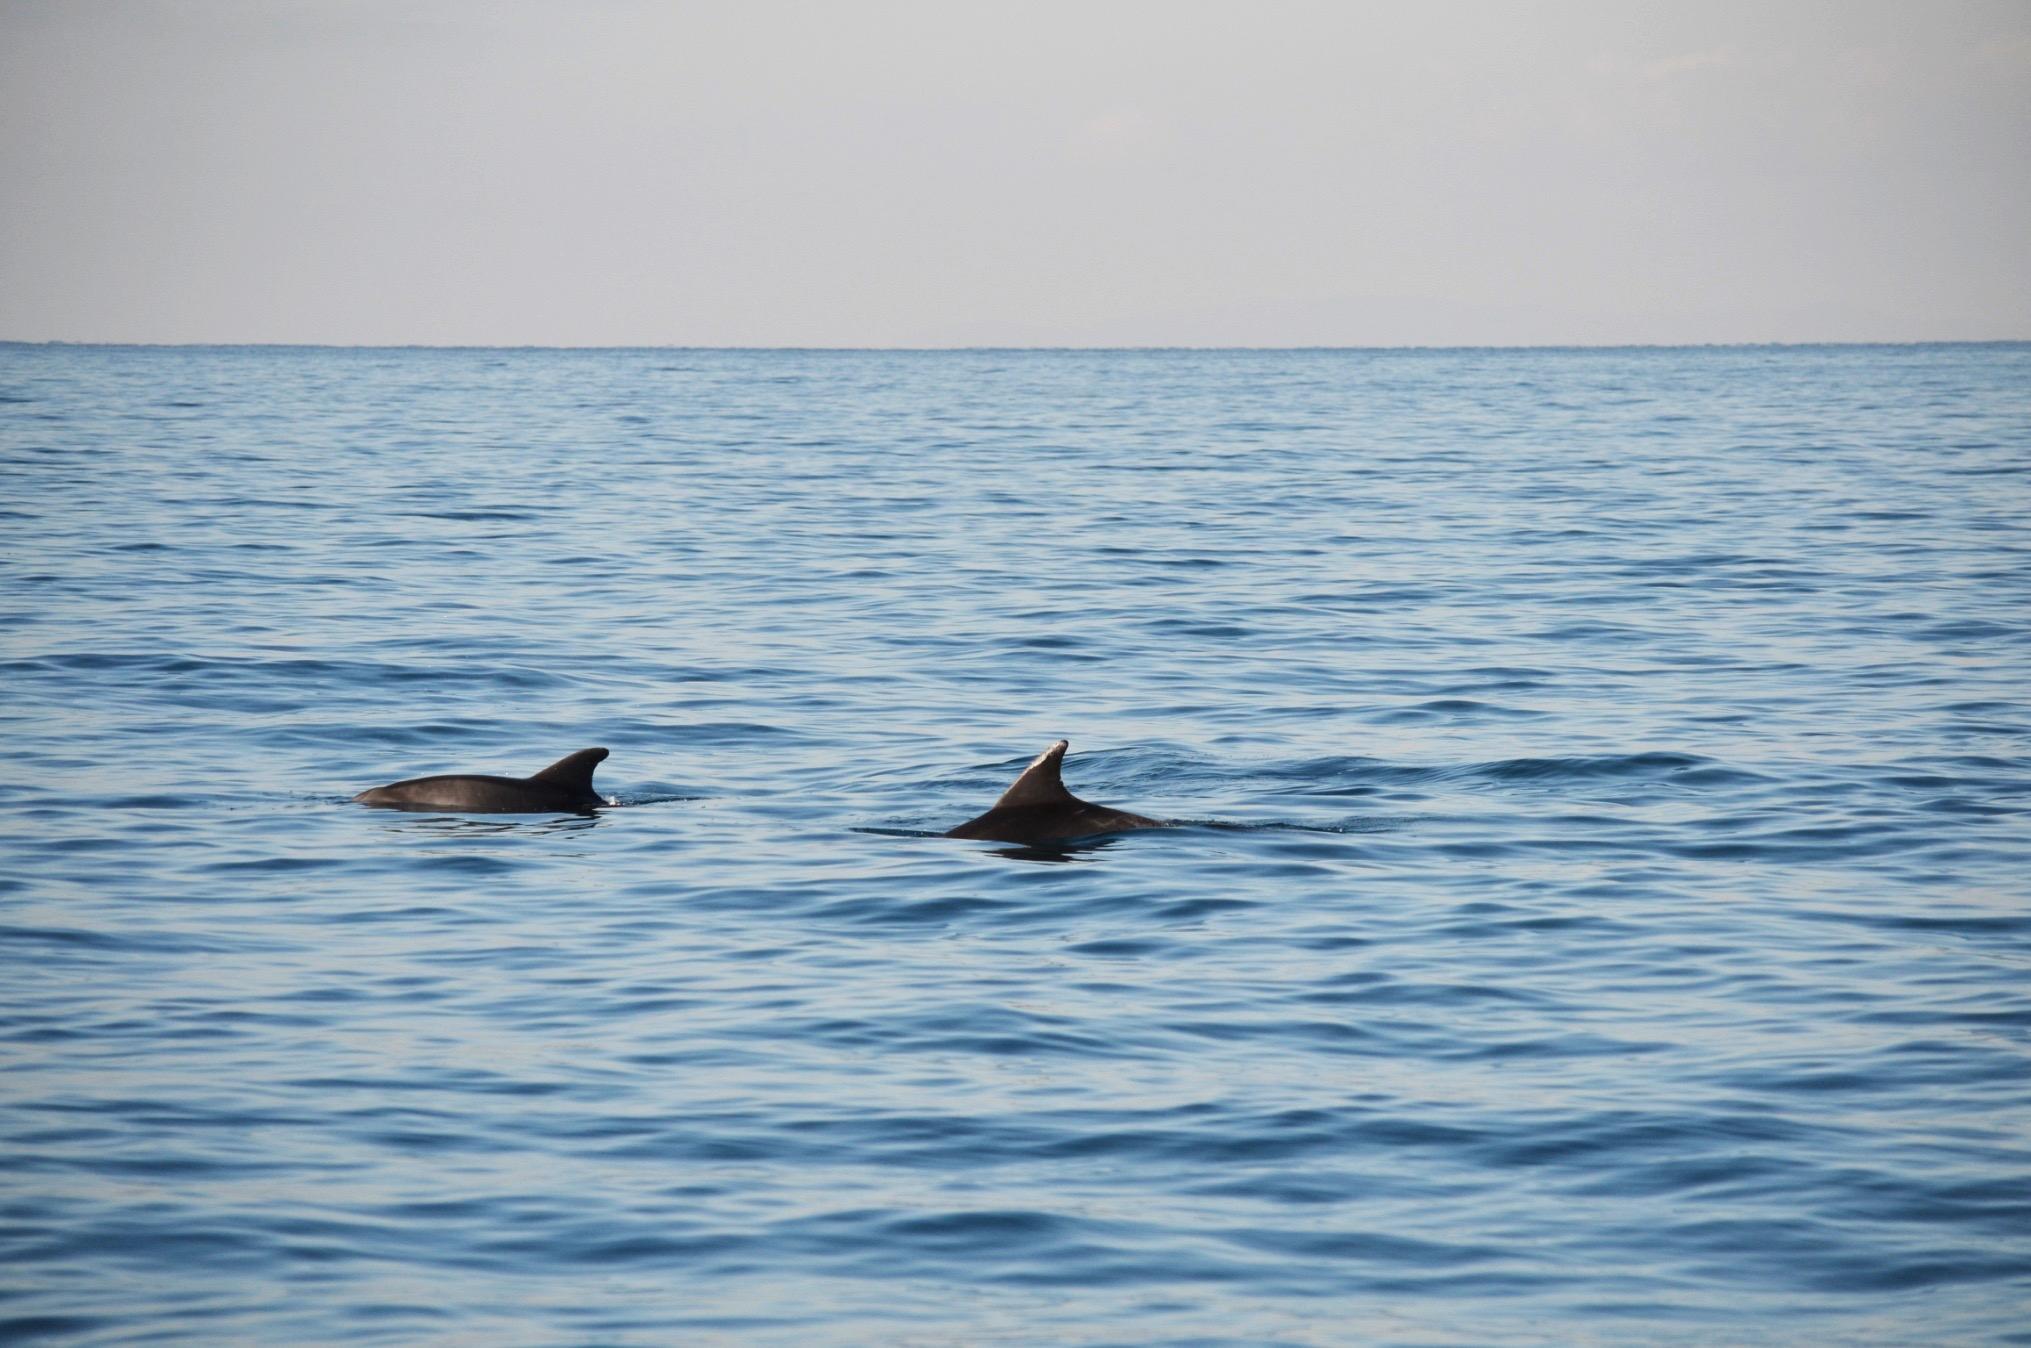 Dolphin Photo Identification Study (DolPhInS)